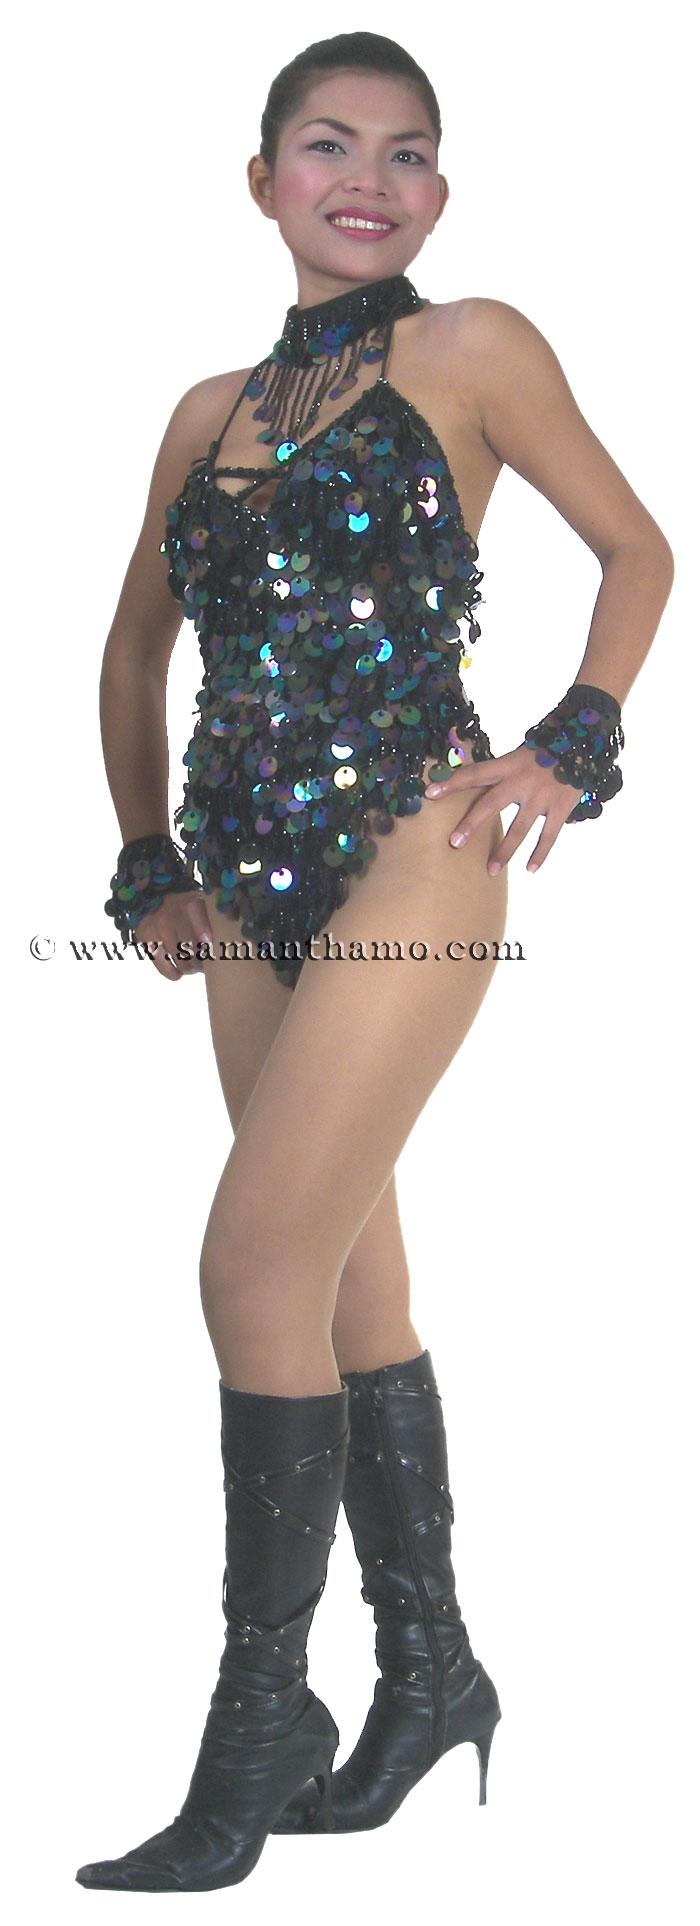 https://michaeljacksoncelebrityclothing.com/sequin-cabaret-clothing/RML354%20black%20SPARKLING%20SEXY%20SEQUIN%20DANCE%20LEOTARD.jpg